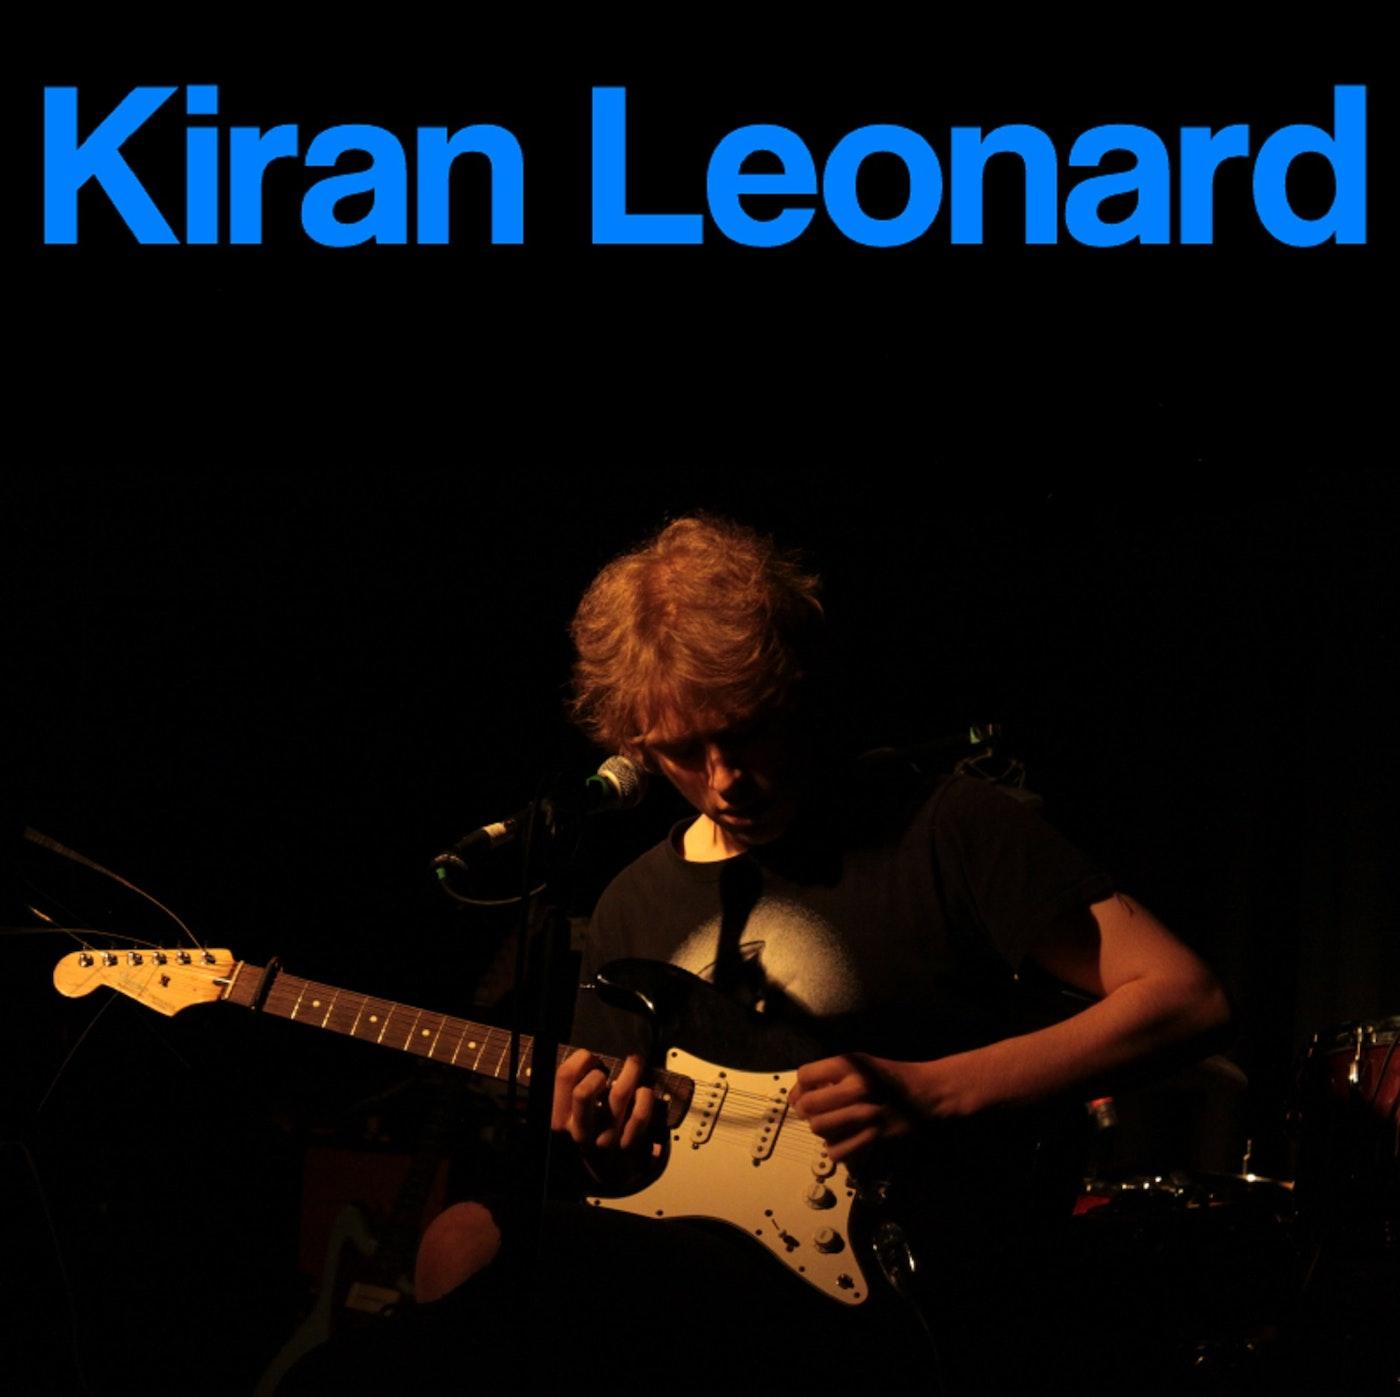 Kiran Leonard